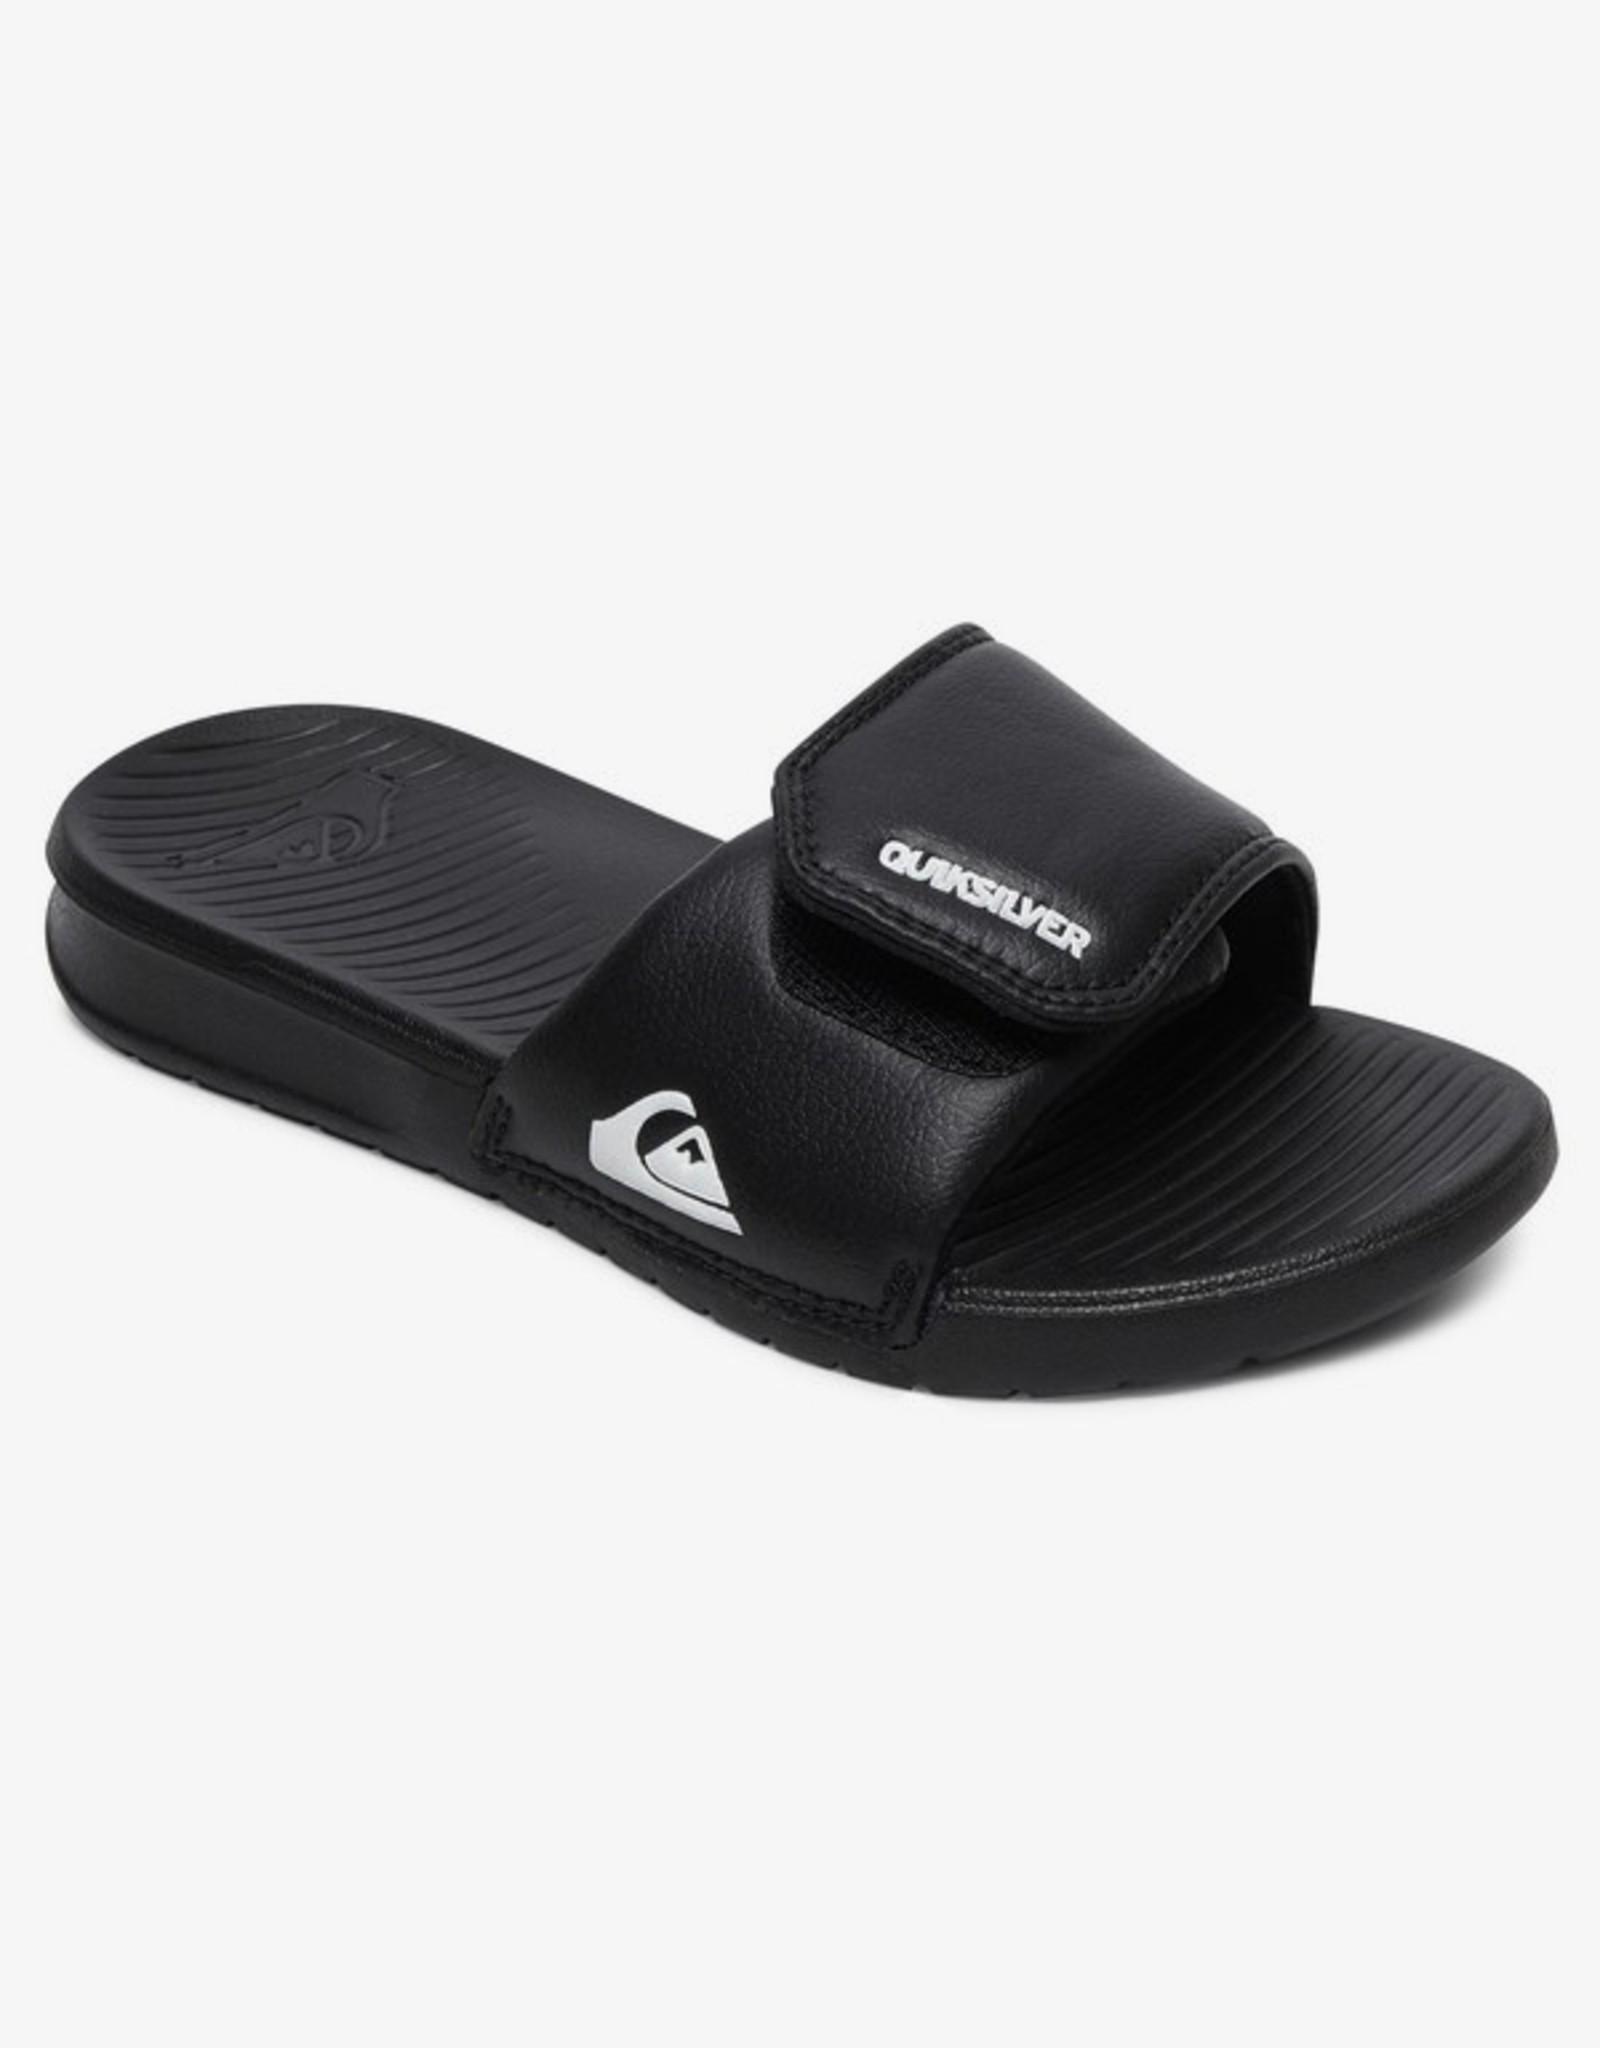 Quiksilver SP21 Bright Coast Slides - Black